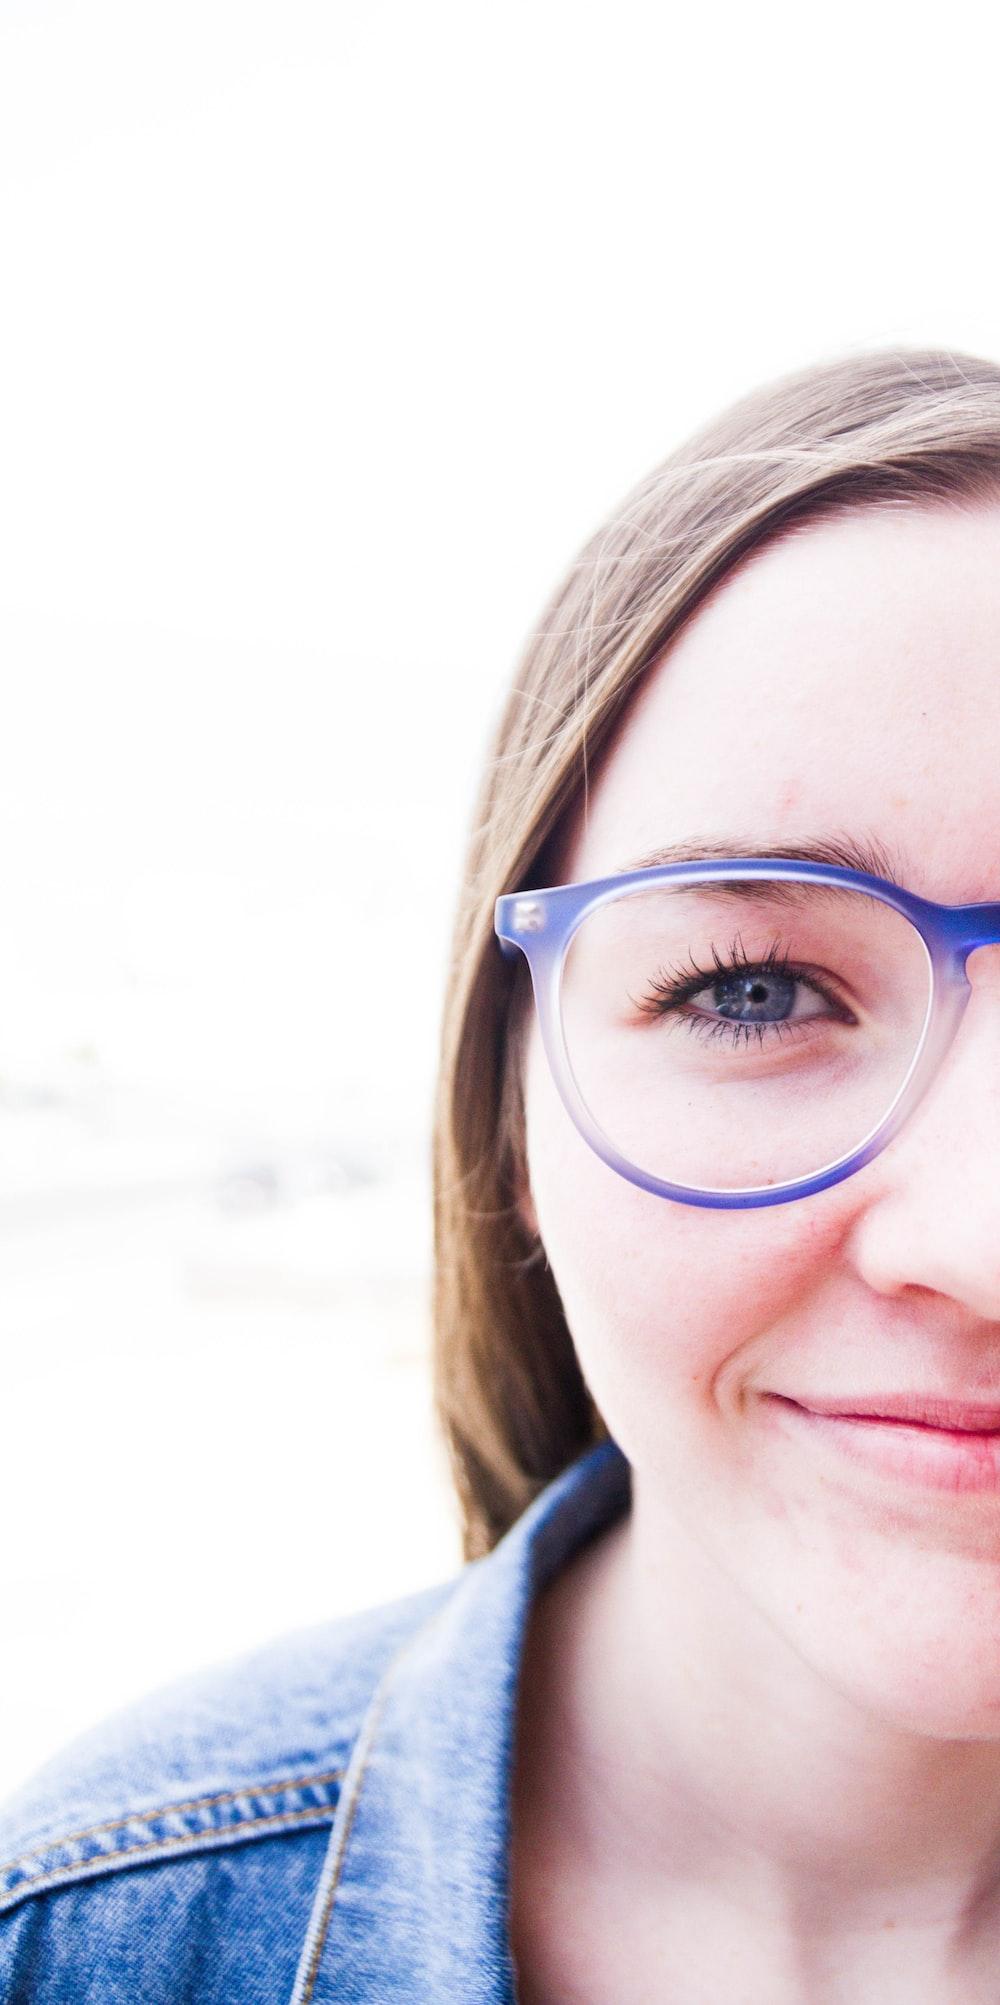 woman wearing blue framed eyeglasses and denim jacket